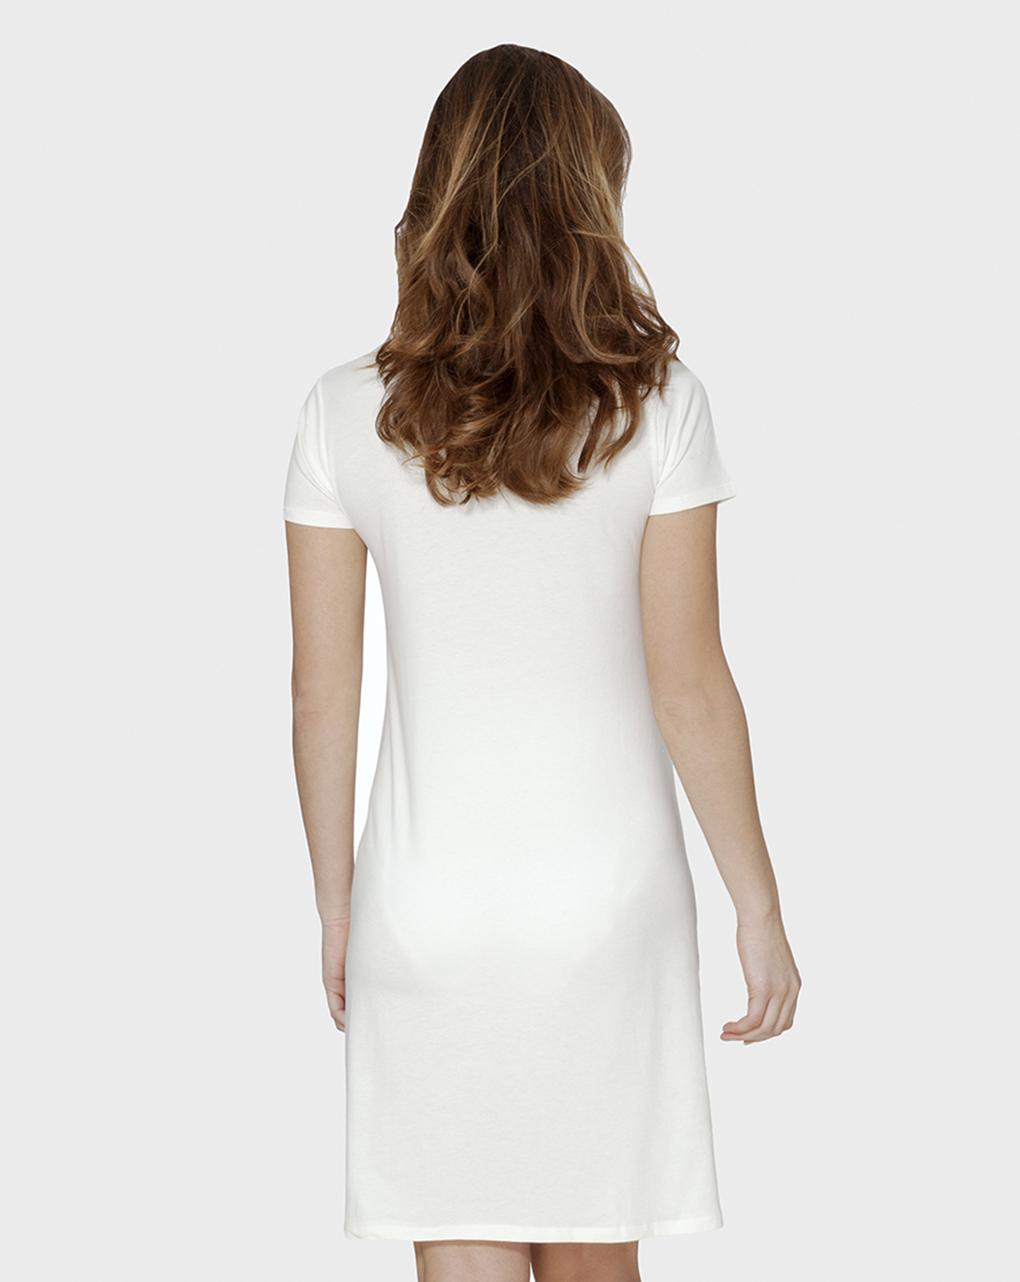 Camisa branca de mangas curtas para parto - Prénatal